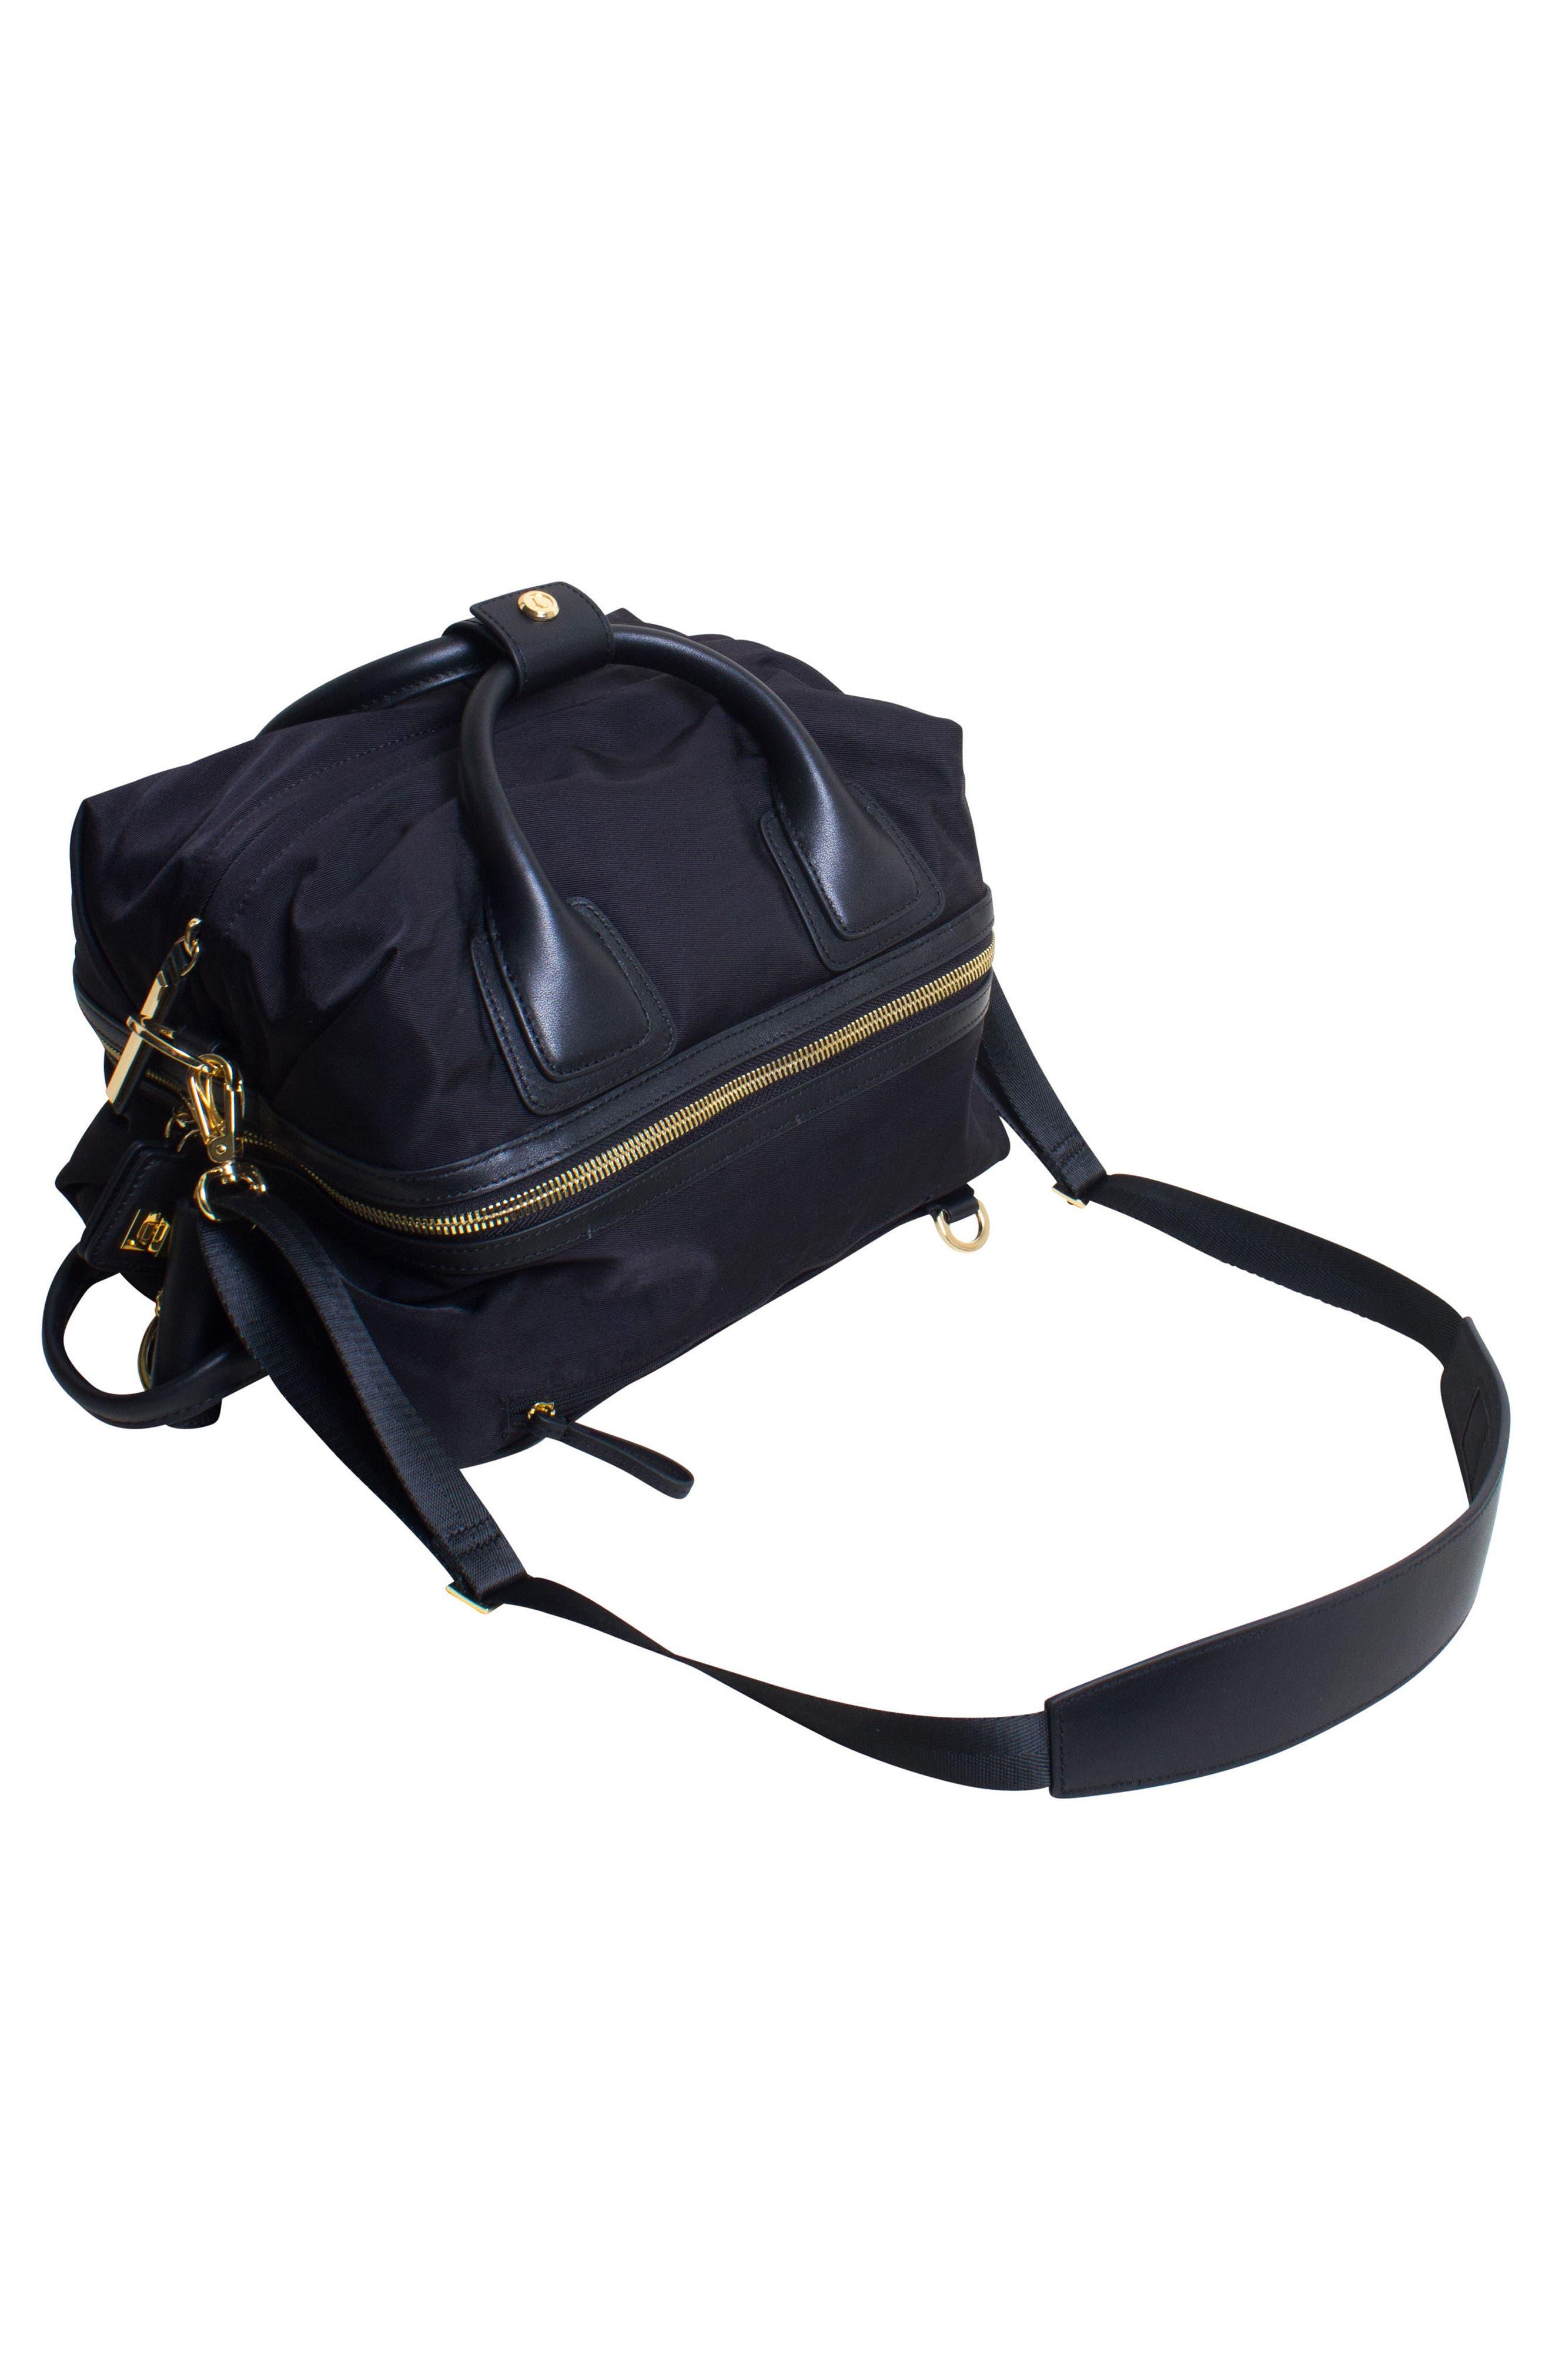 Studio Duffel Backpack,                             Alternate thumbnail 2, color,                             BLACK/ GOLD